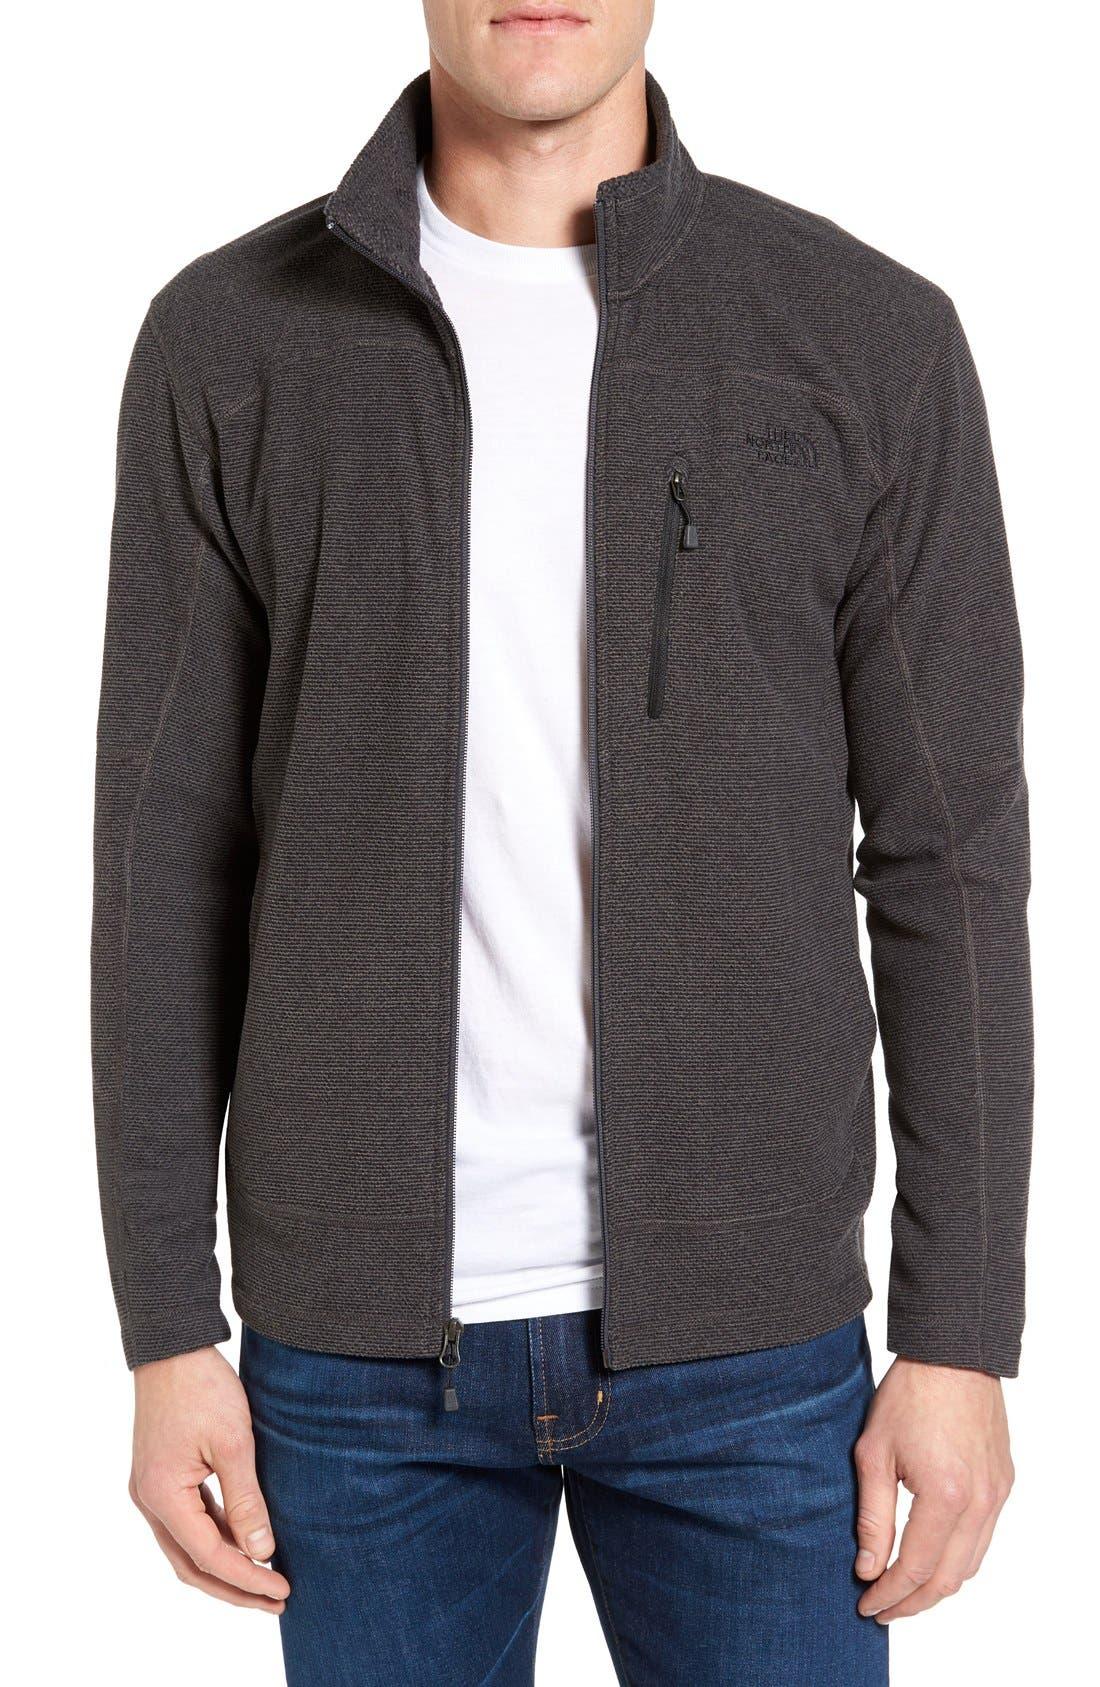 Alternate Image 1 Selected - The North Face 'Texture Cap Rock' Fleece Jacket